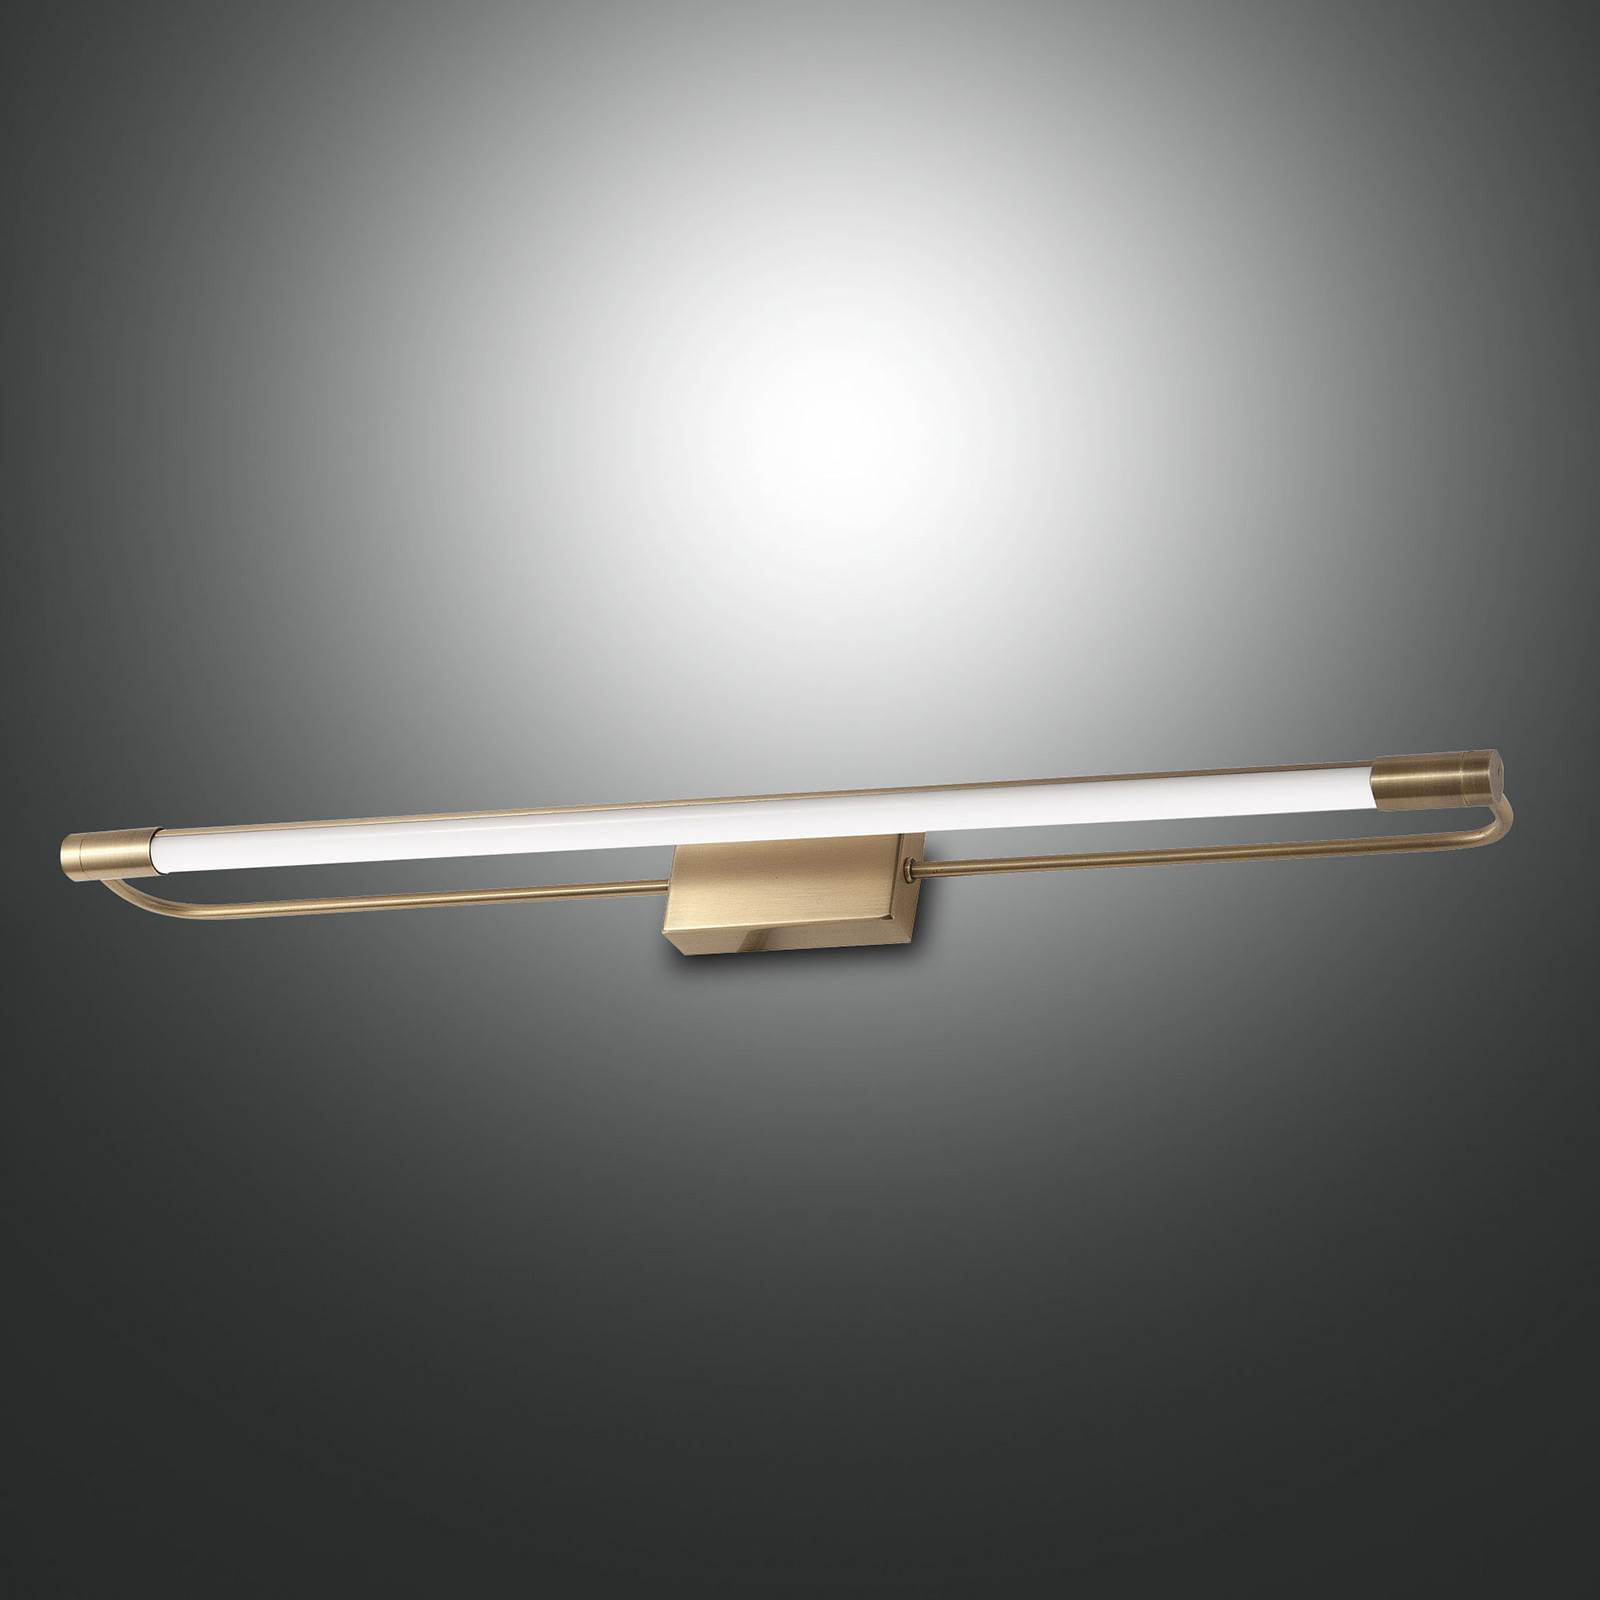 LED-Wandleuchte Rapallo, messing, IP44, 80 cm